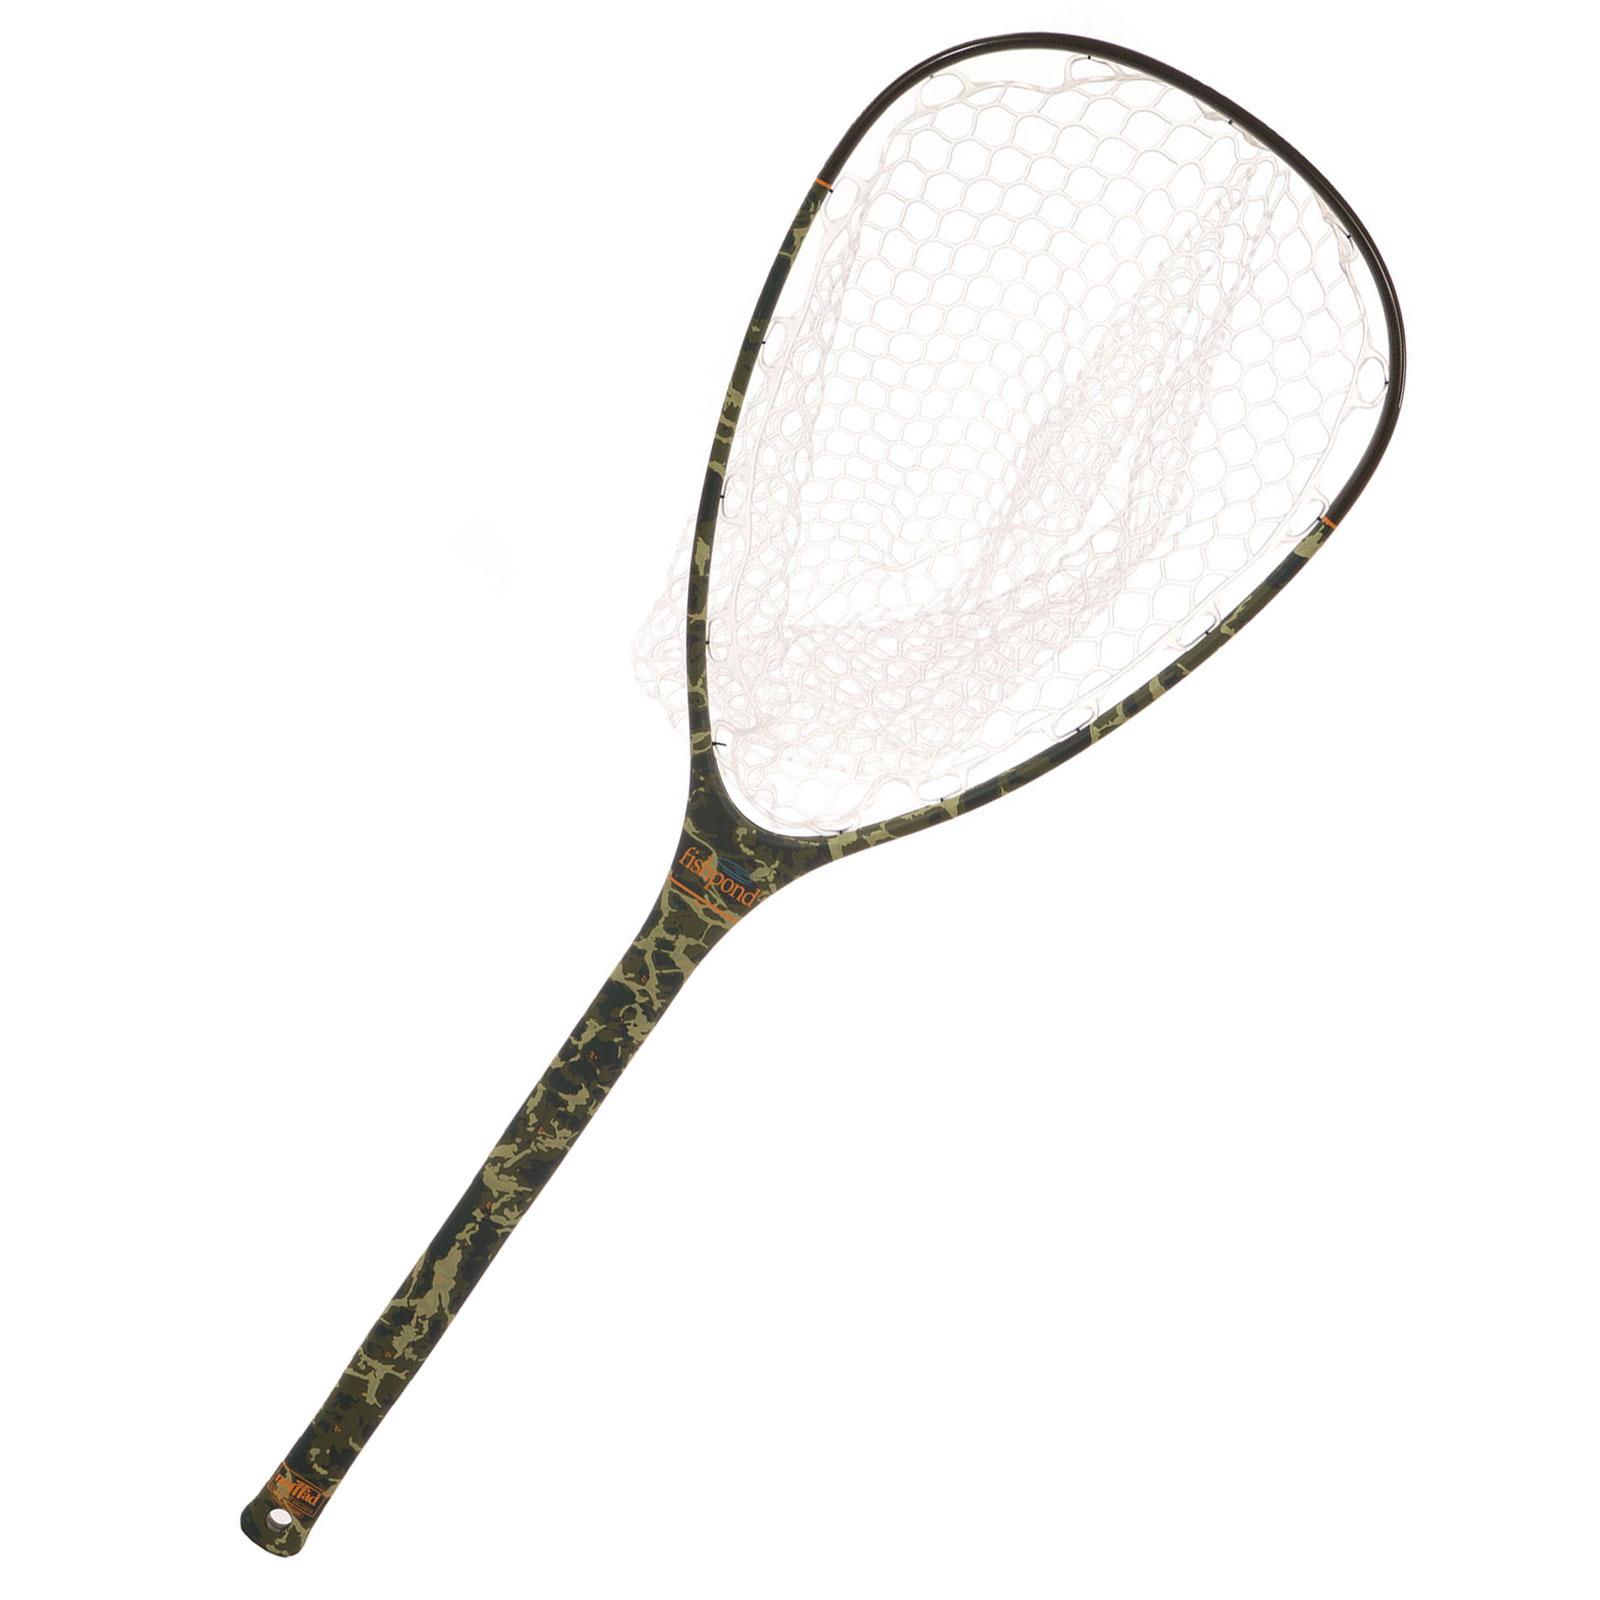 Fishpond nomad fly fishing carbon fiber fiberglass for Fishpond fly fishing